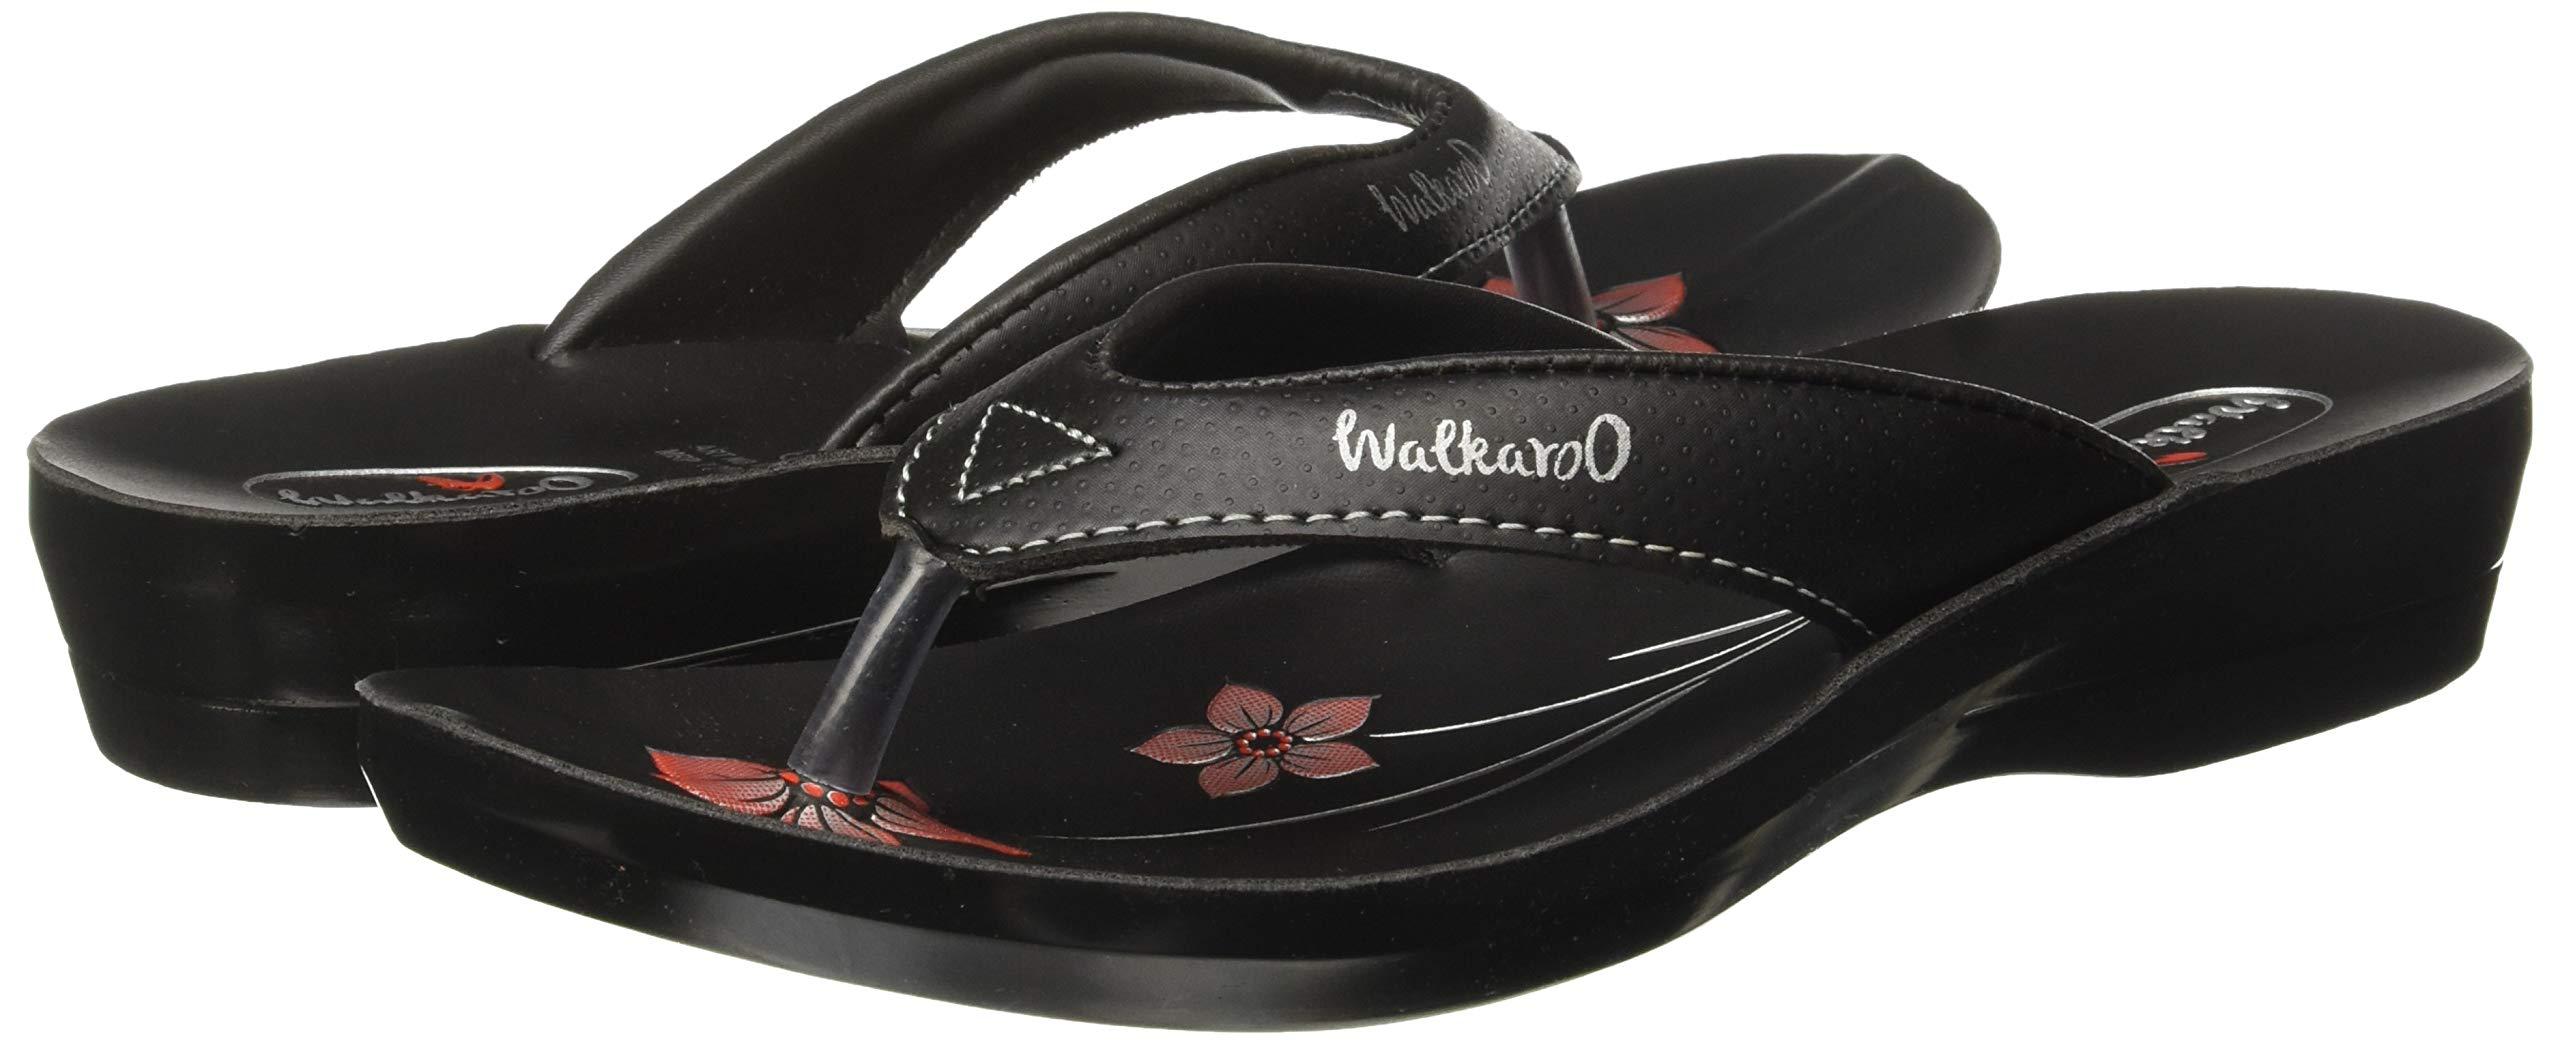 Walkaroo By Vkc Women S Fashion Sandals Buy Online In Burkina Faso At Desertcart Productid 189502678